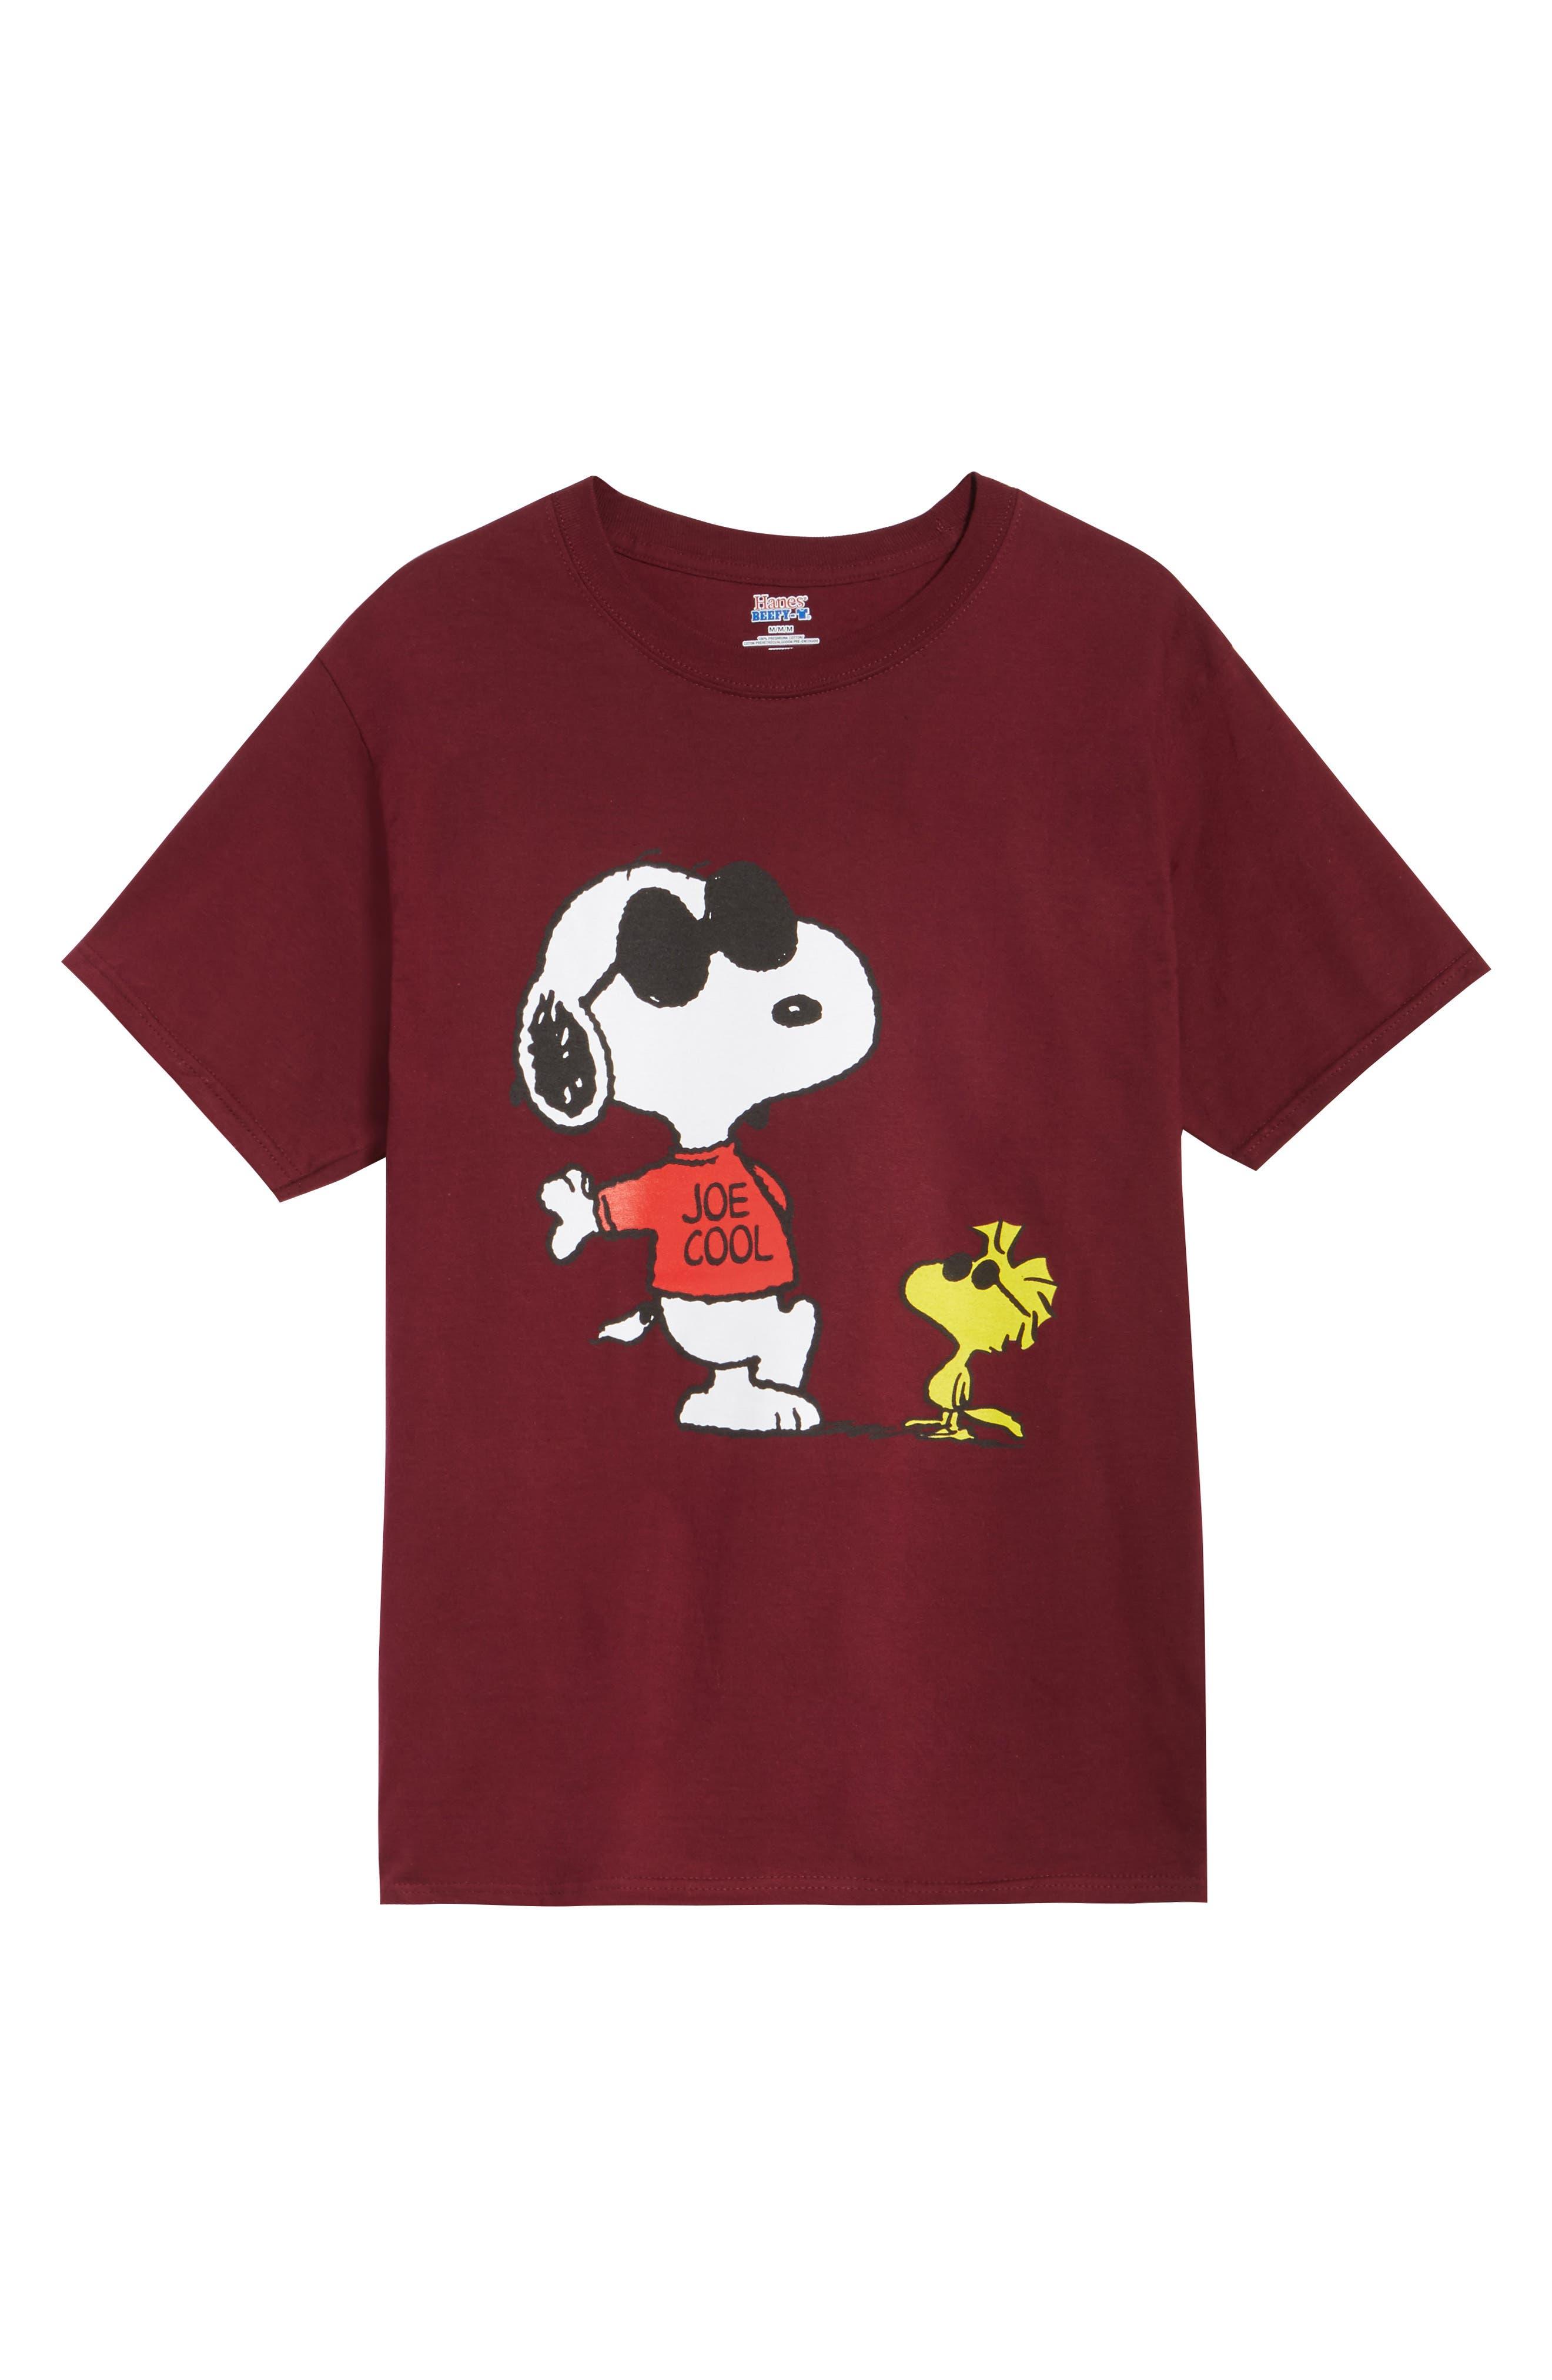 Peanuts Joe Cool T-Shirt